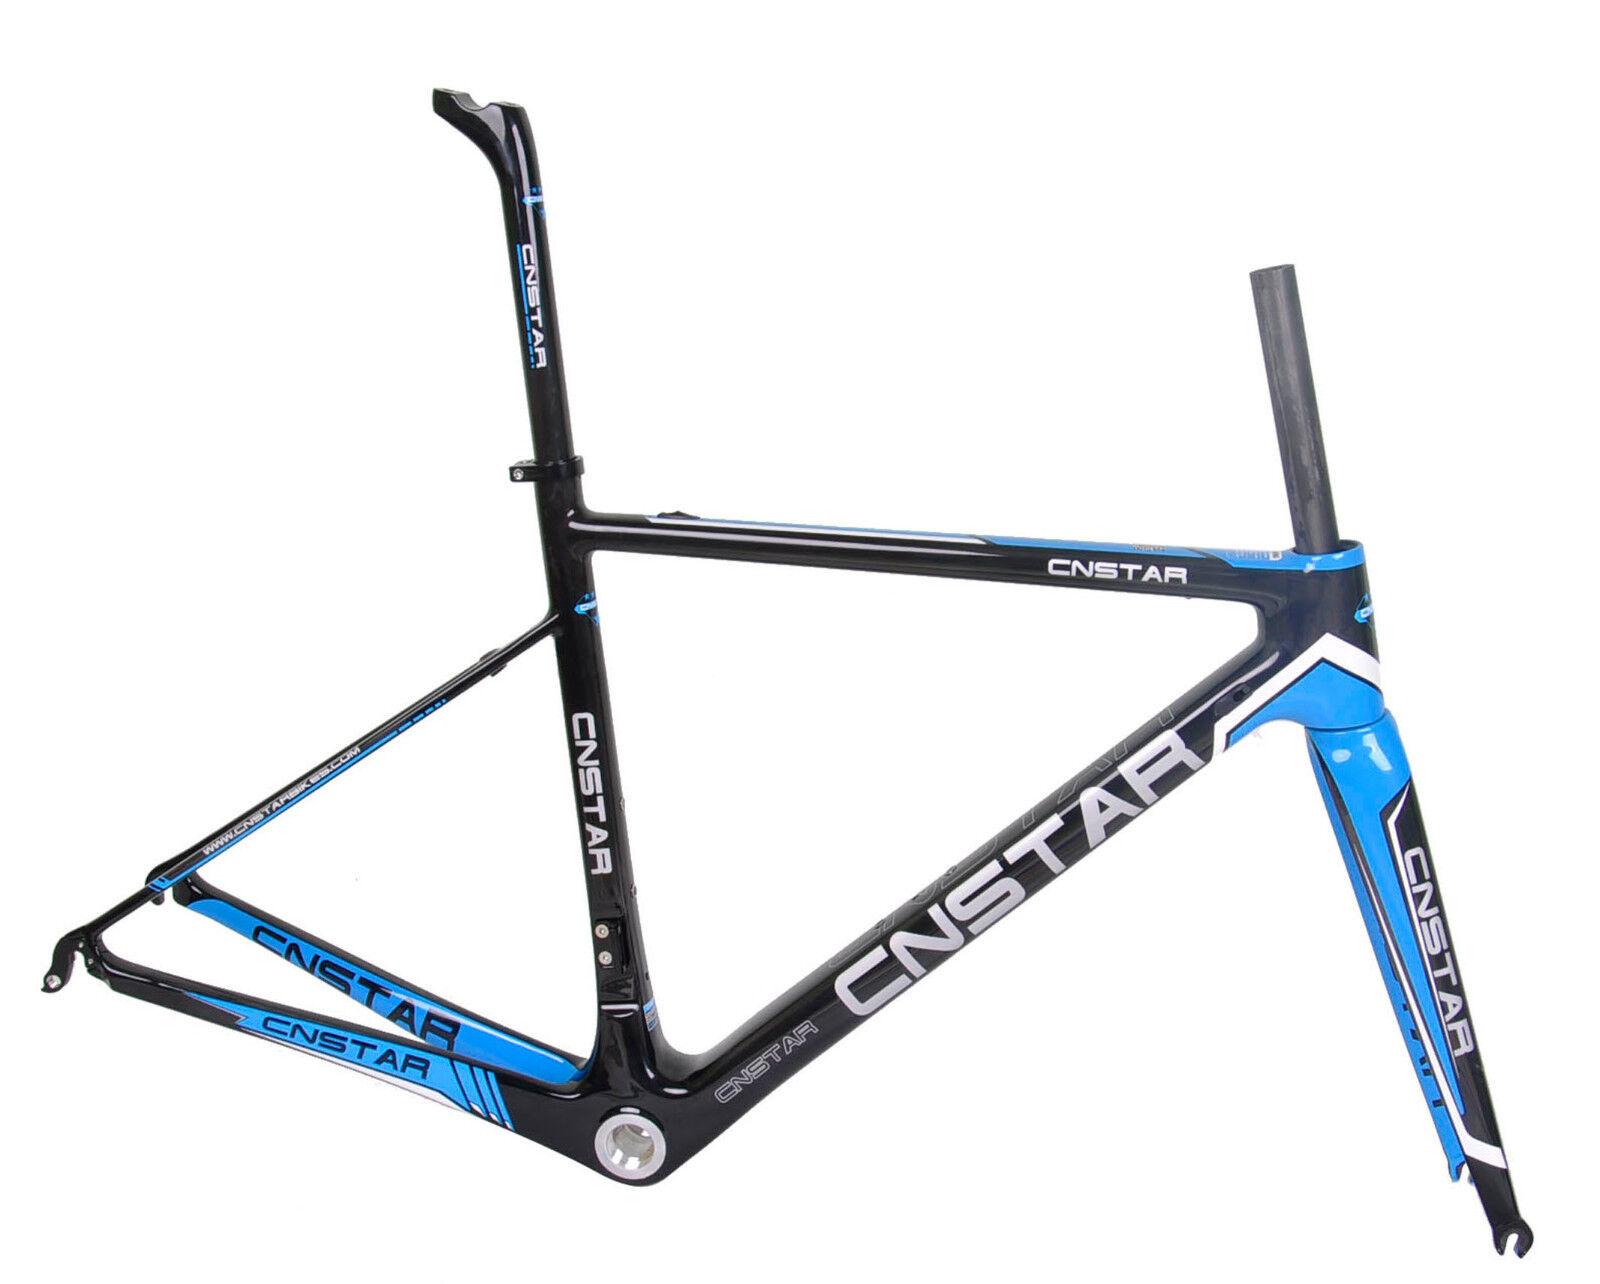 50 cm BSA Carbone Route Cadre Fourche Vélo Tige de selle Di2 Brillant Course 700 C bleu CNSTAR